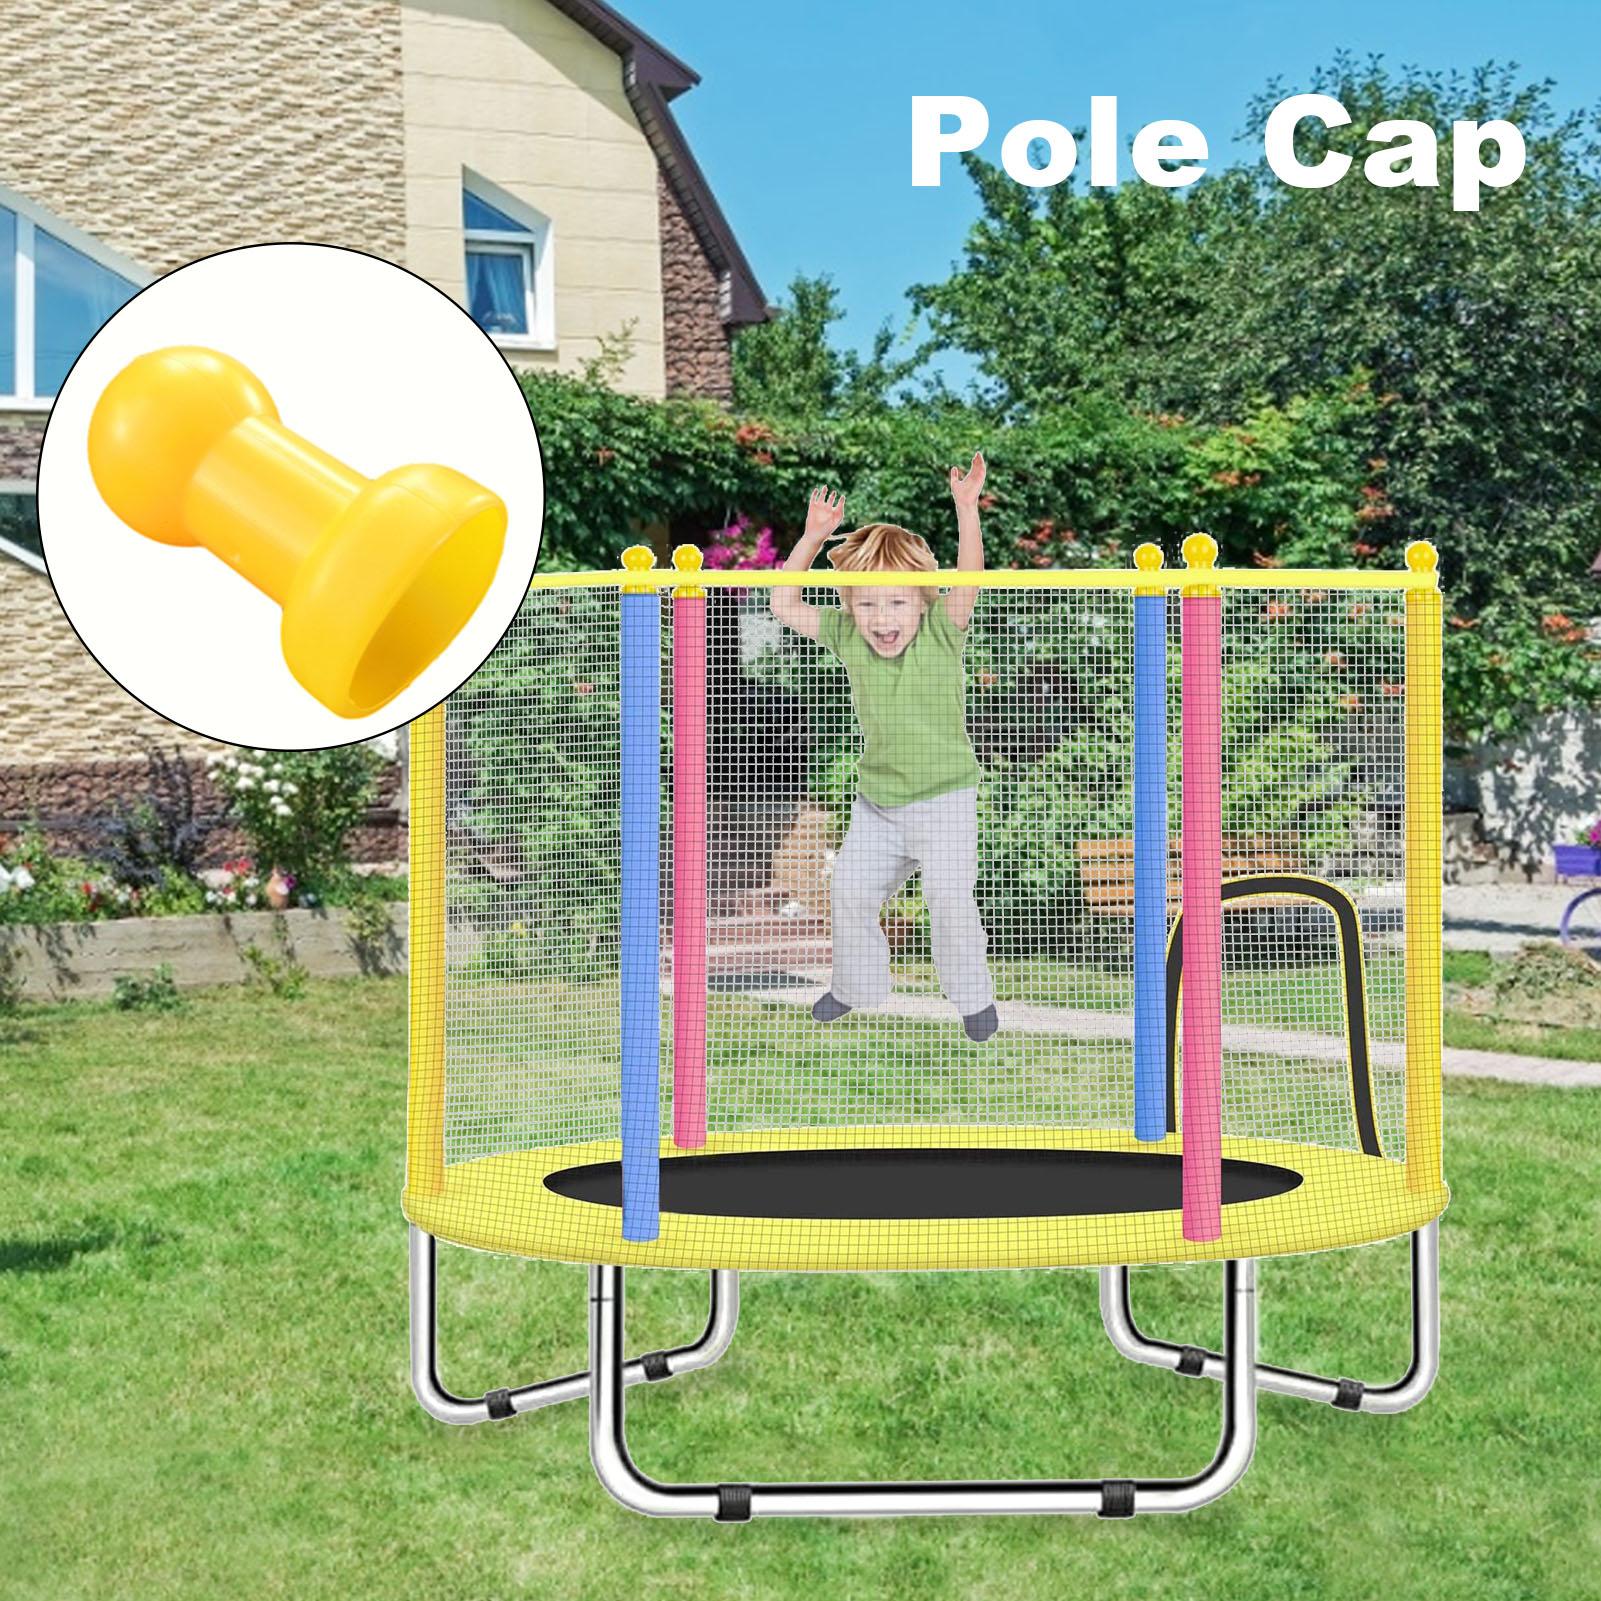 ChildrenTrampoline Pole Cap Steel Pipe Top Cover Yellow Plastic Cover For Children Trampoline Outdoor Sport Accessories